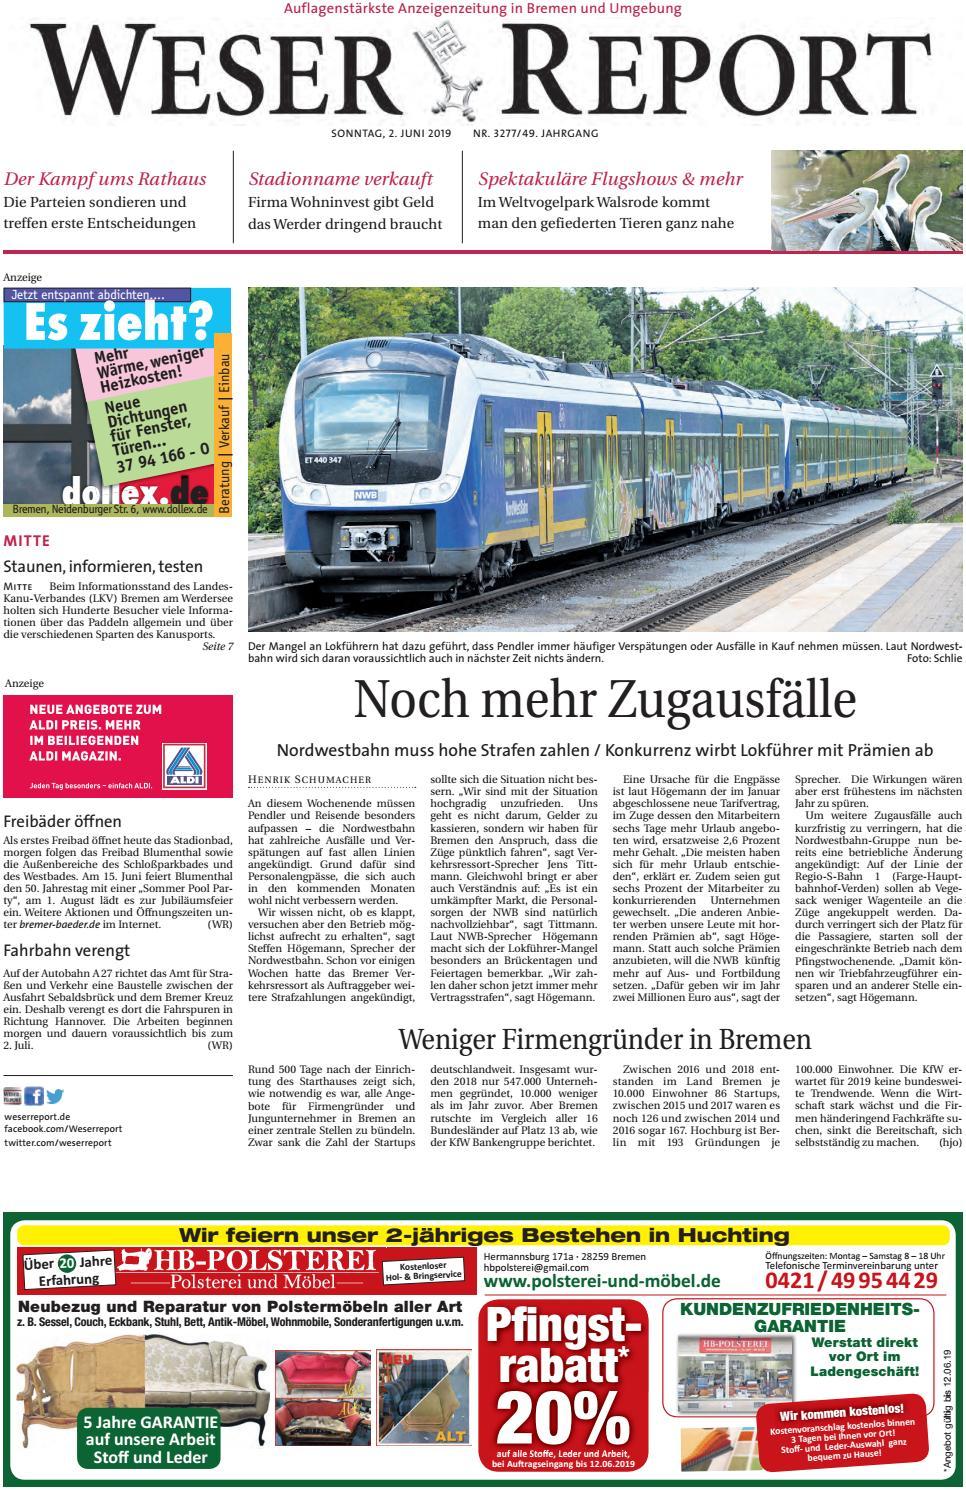 Weser Report Mitte vom 02.06.2019 by KPS